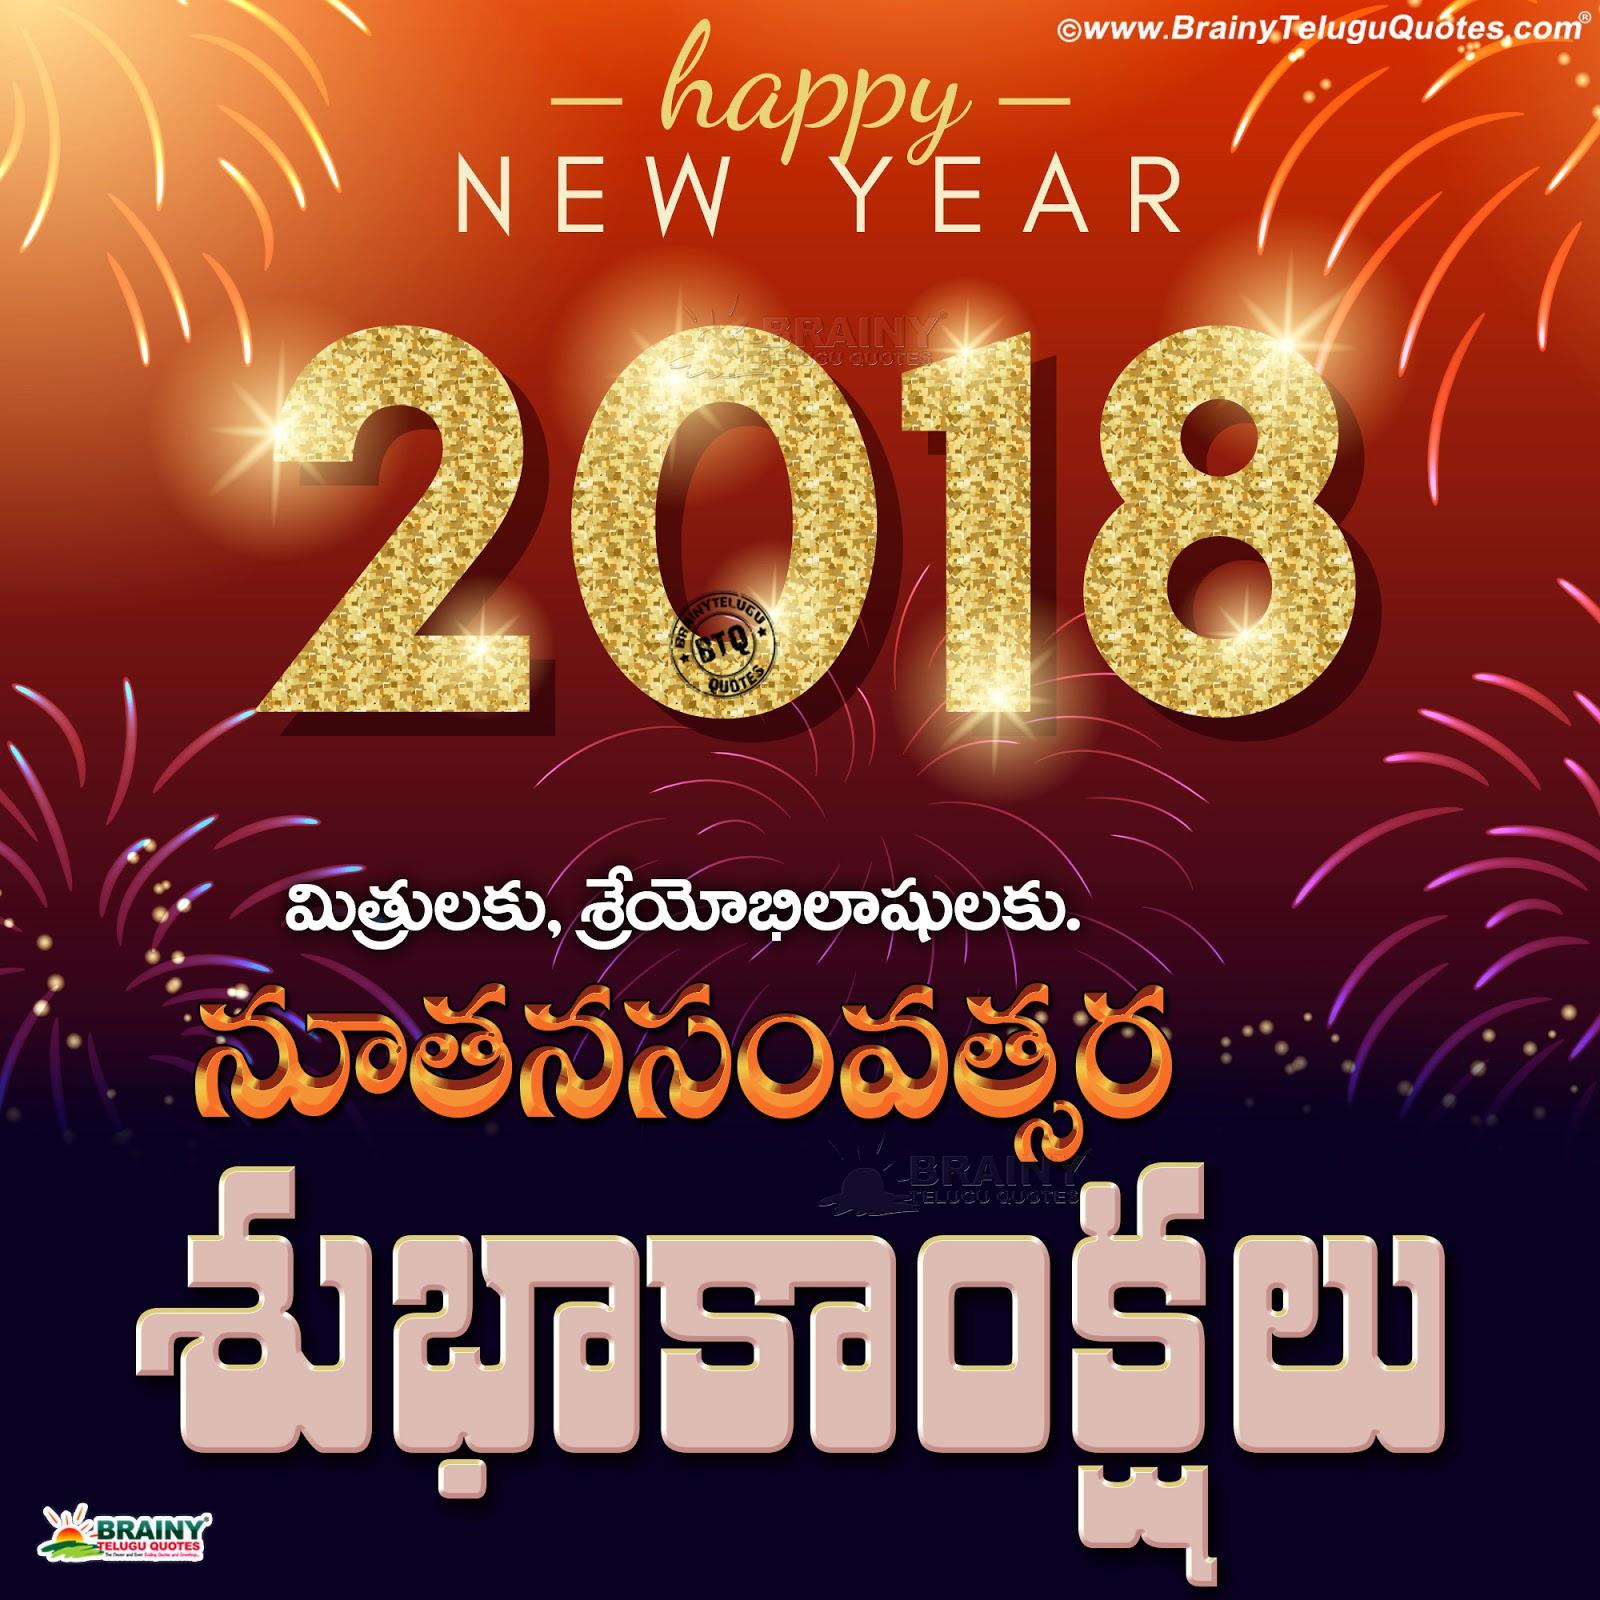 Wishing You Happy New Year Greetings Hd Wallpapers In Telugu